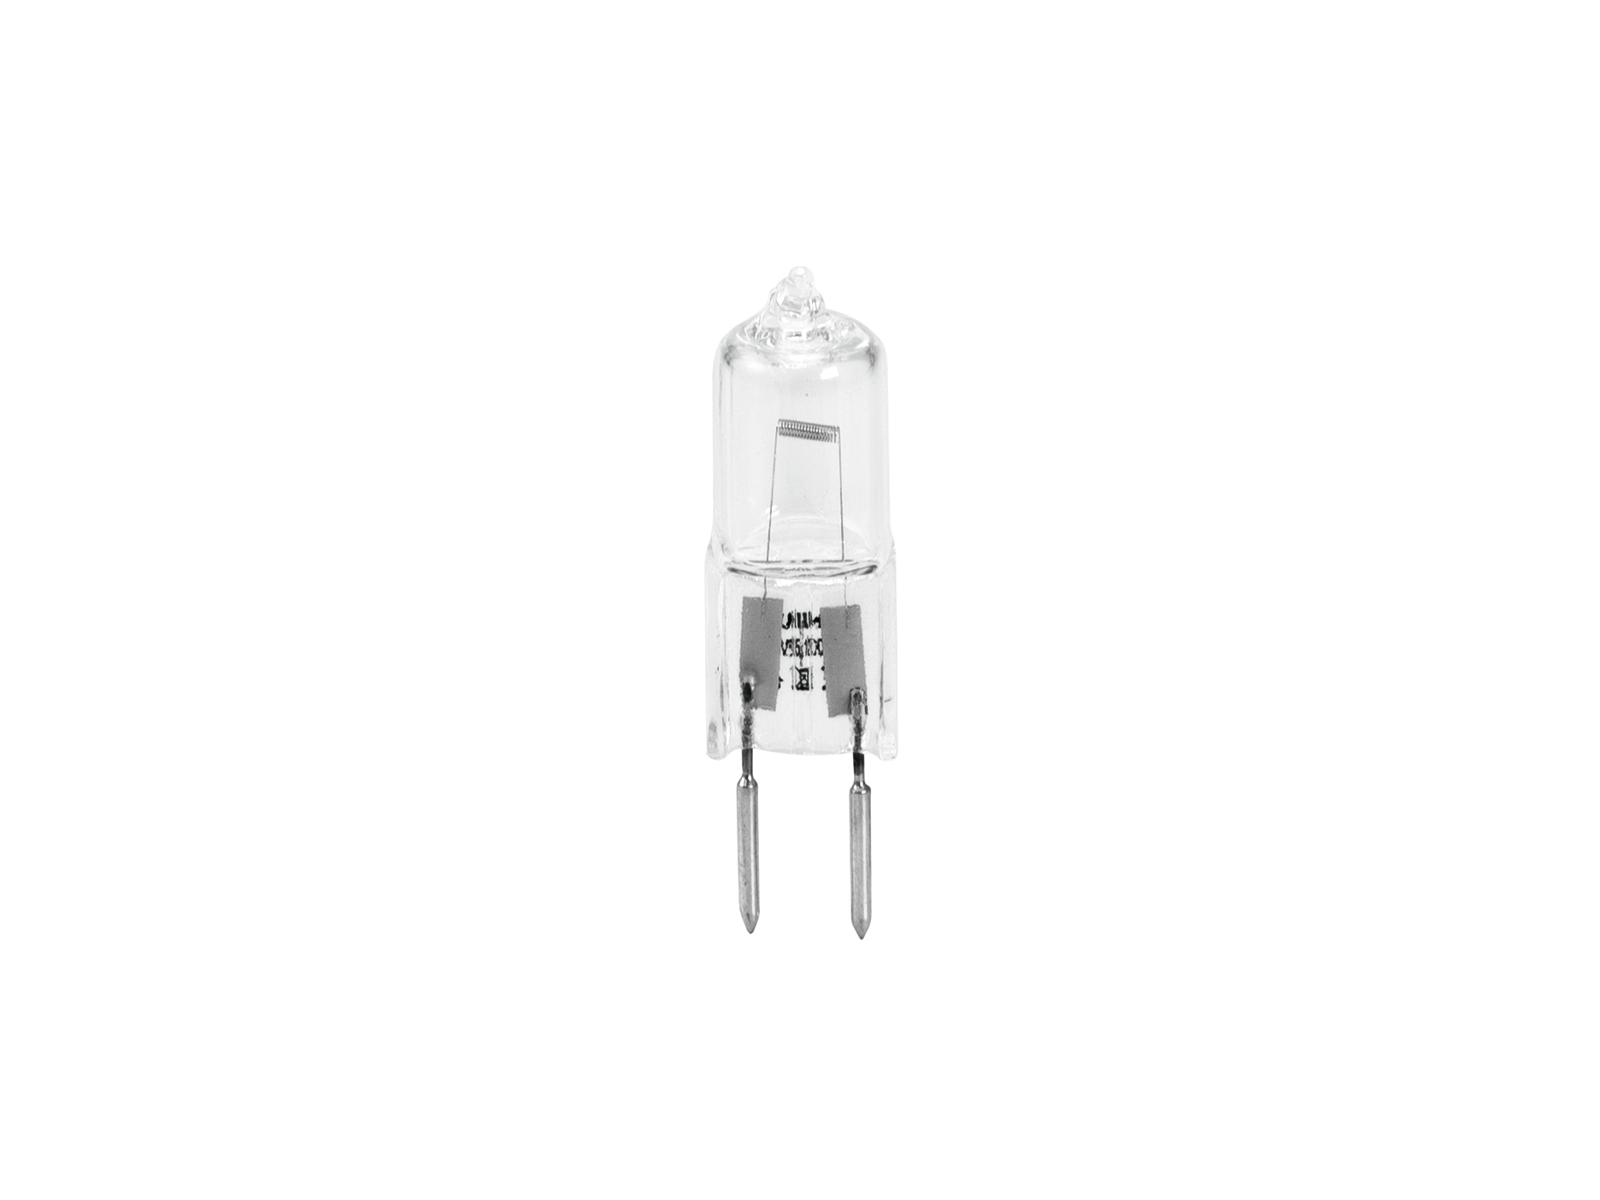 12V/100W G 6,35 FCR Omnilux